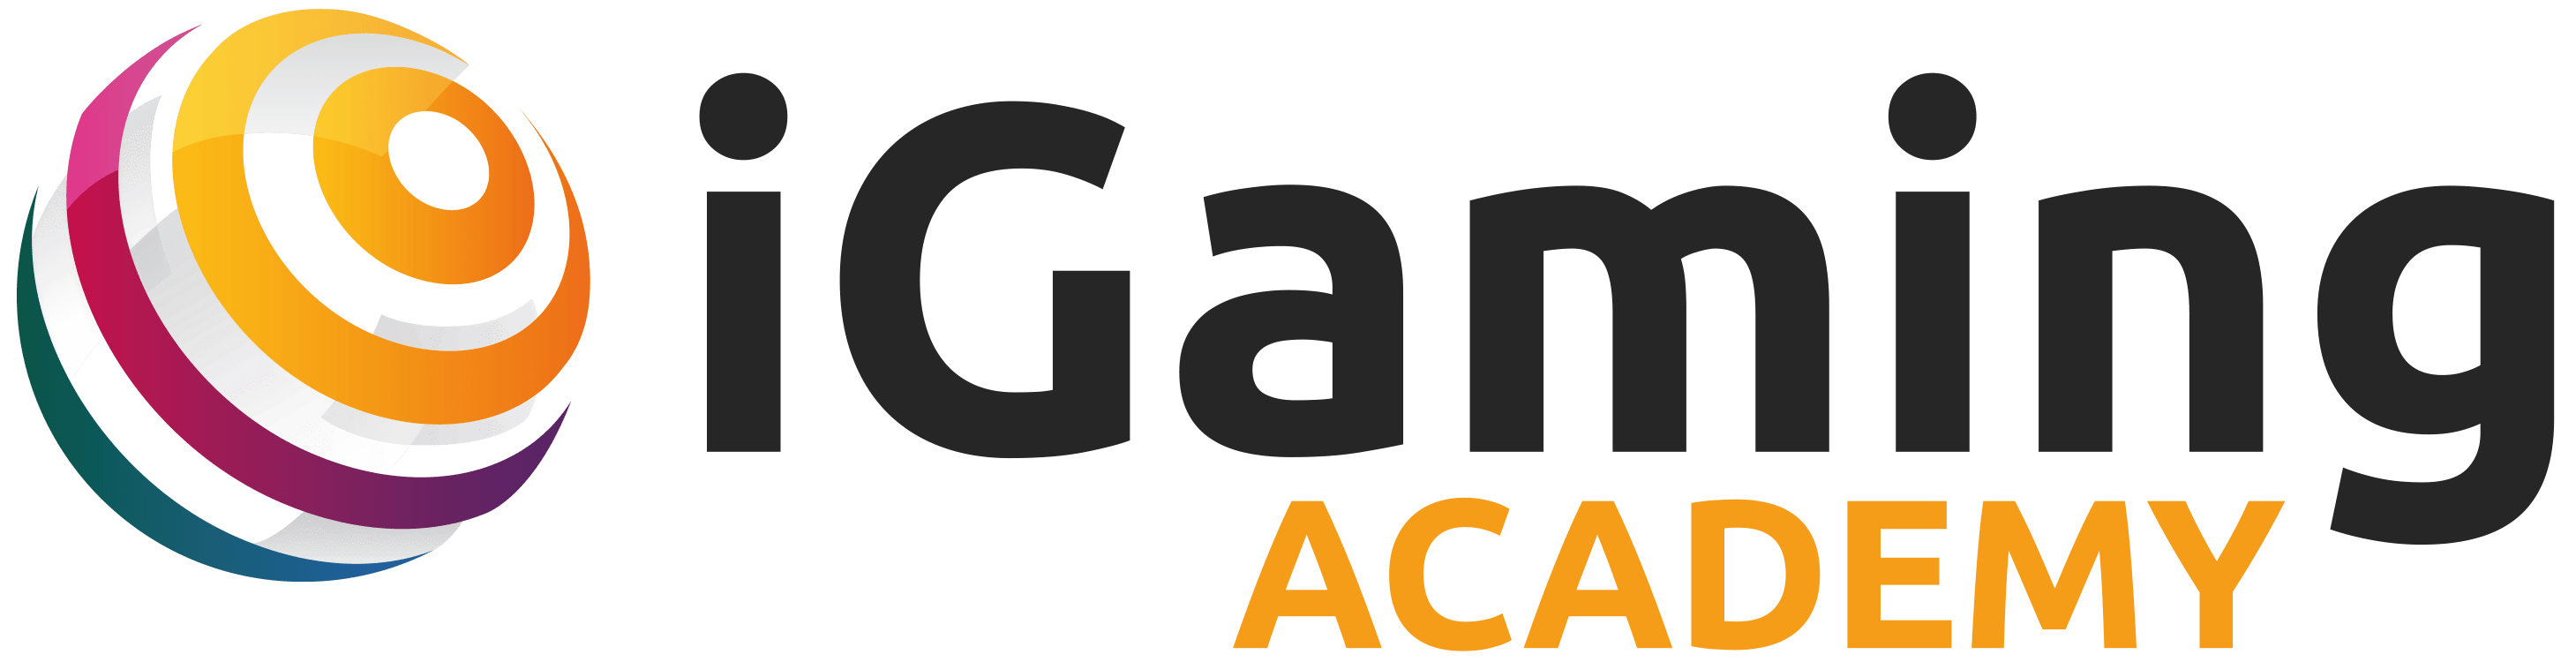 iGaming Academy Ltd